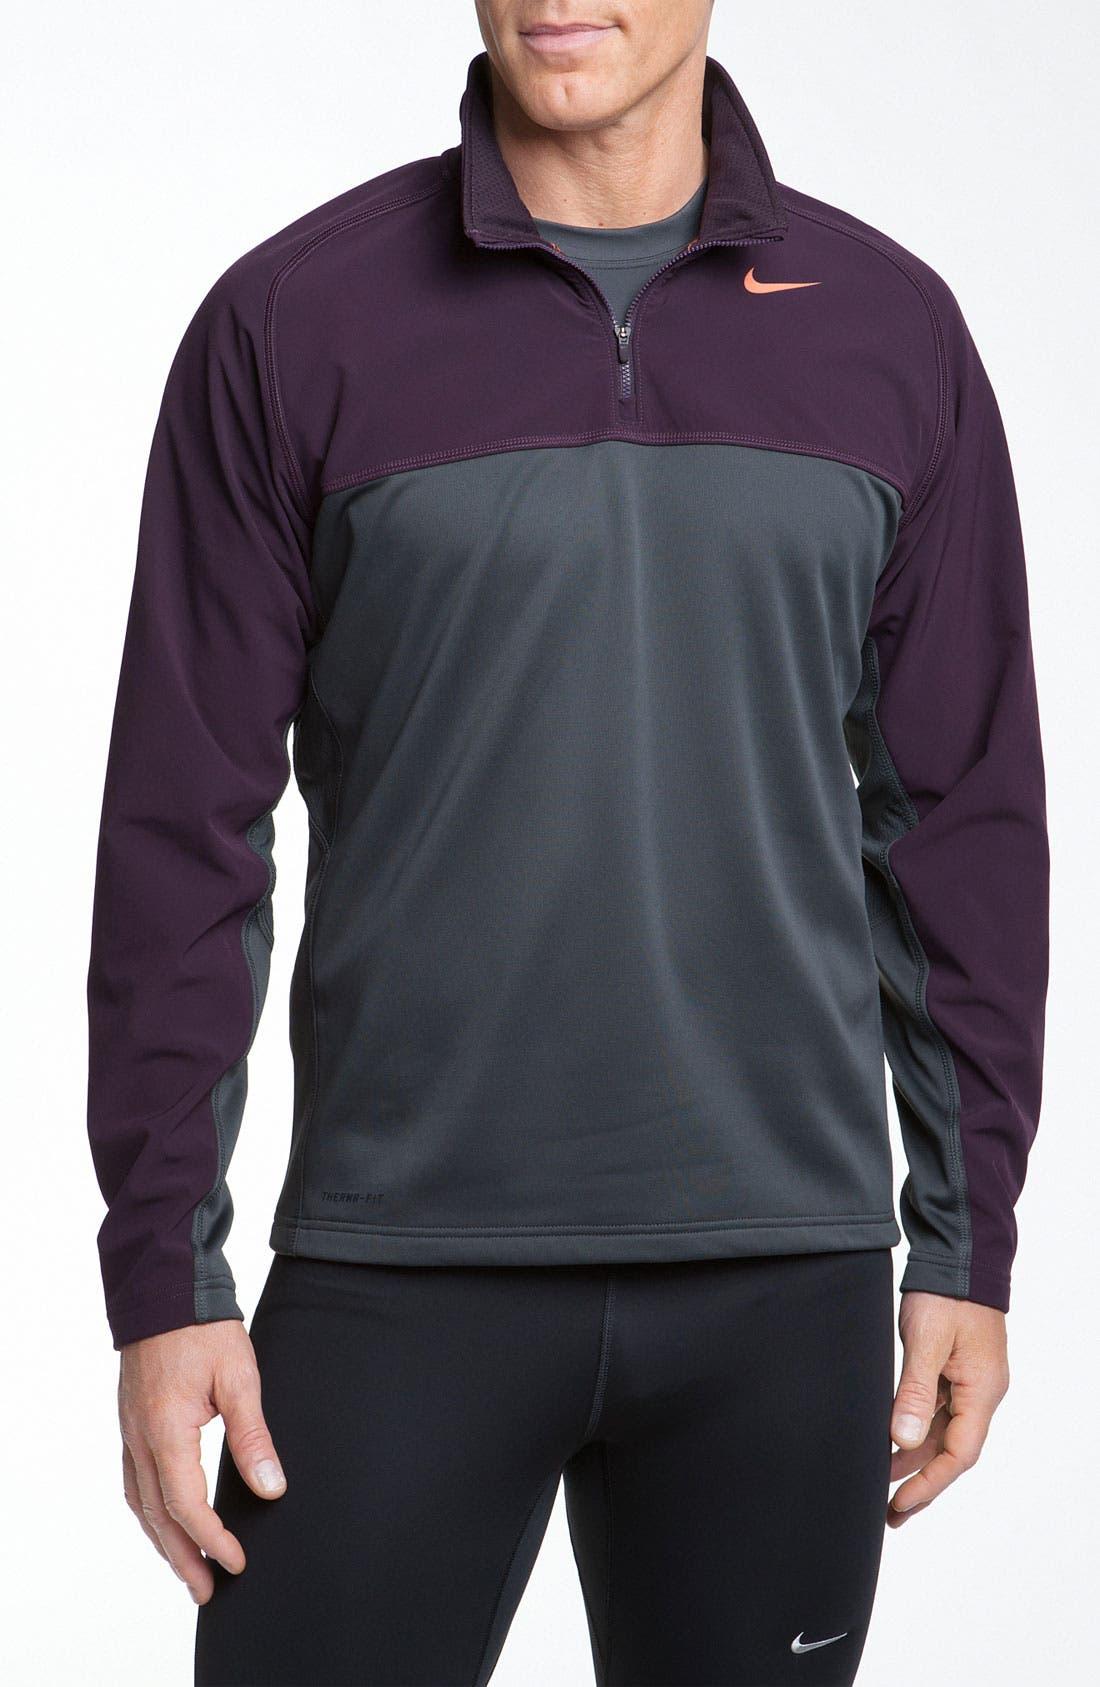 Main Image - Nike 'Shield' Therma-FIT Fleece Quarter Zip Top